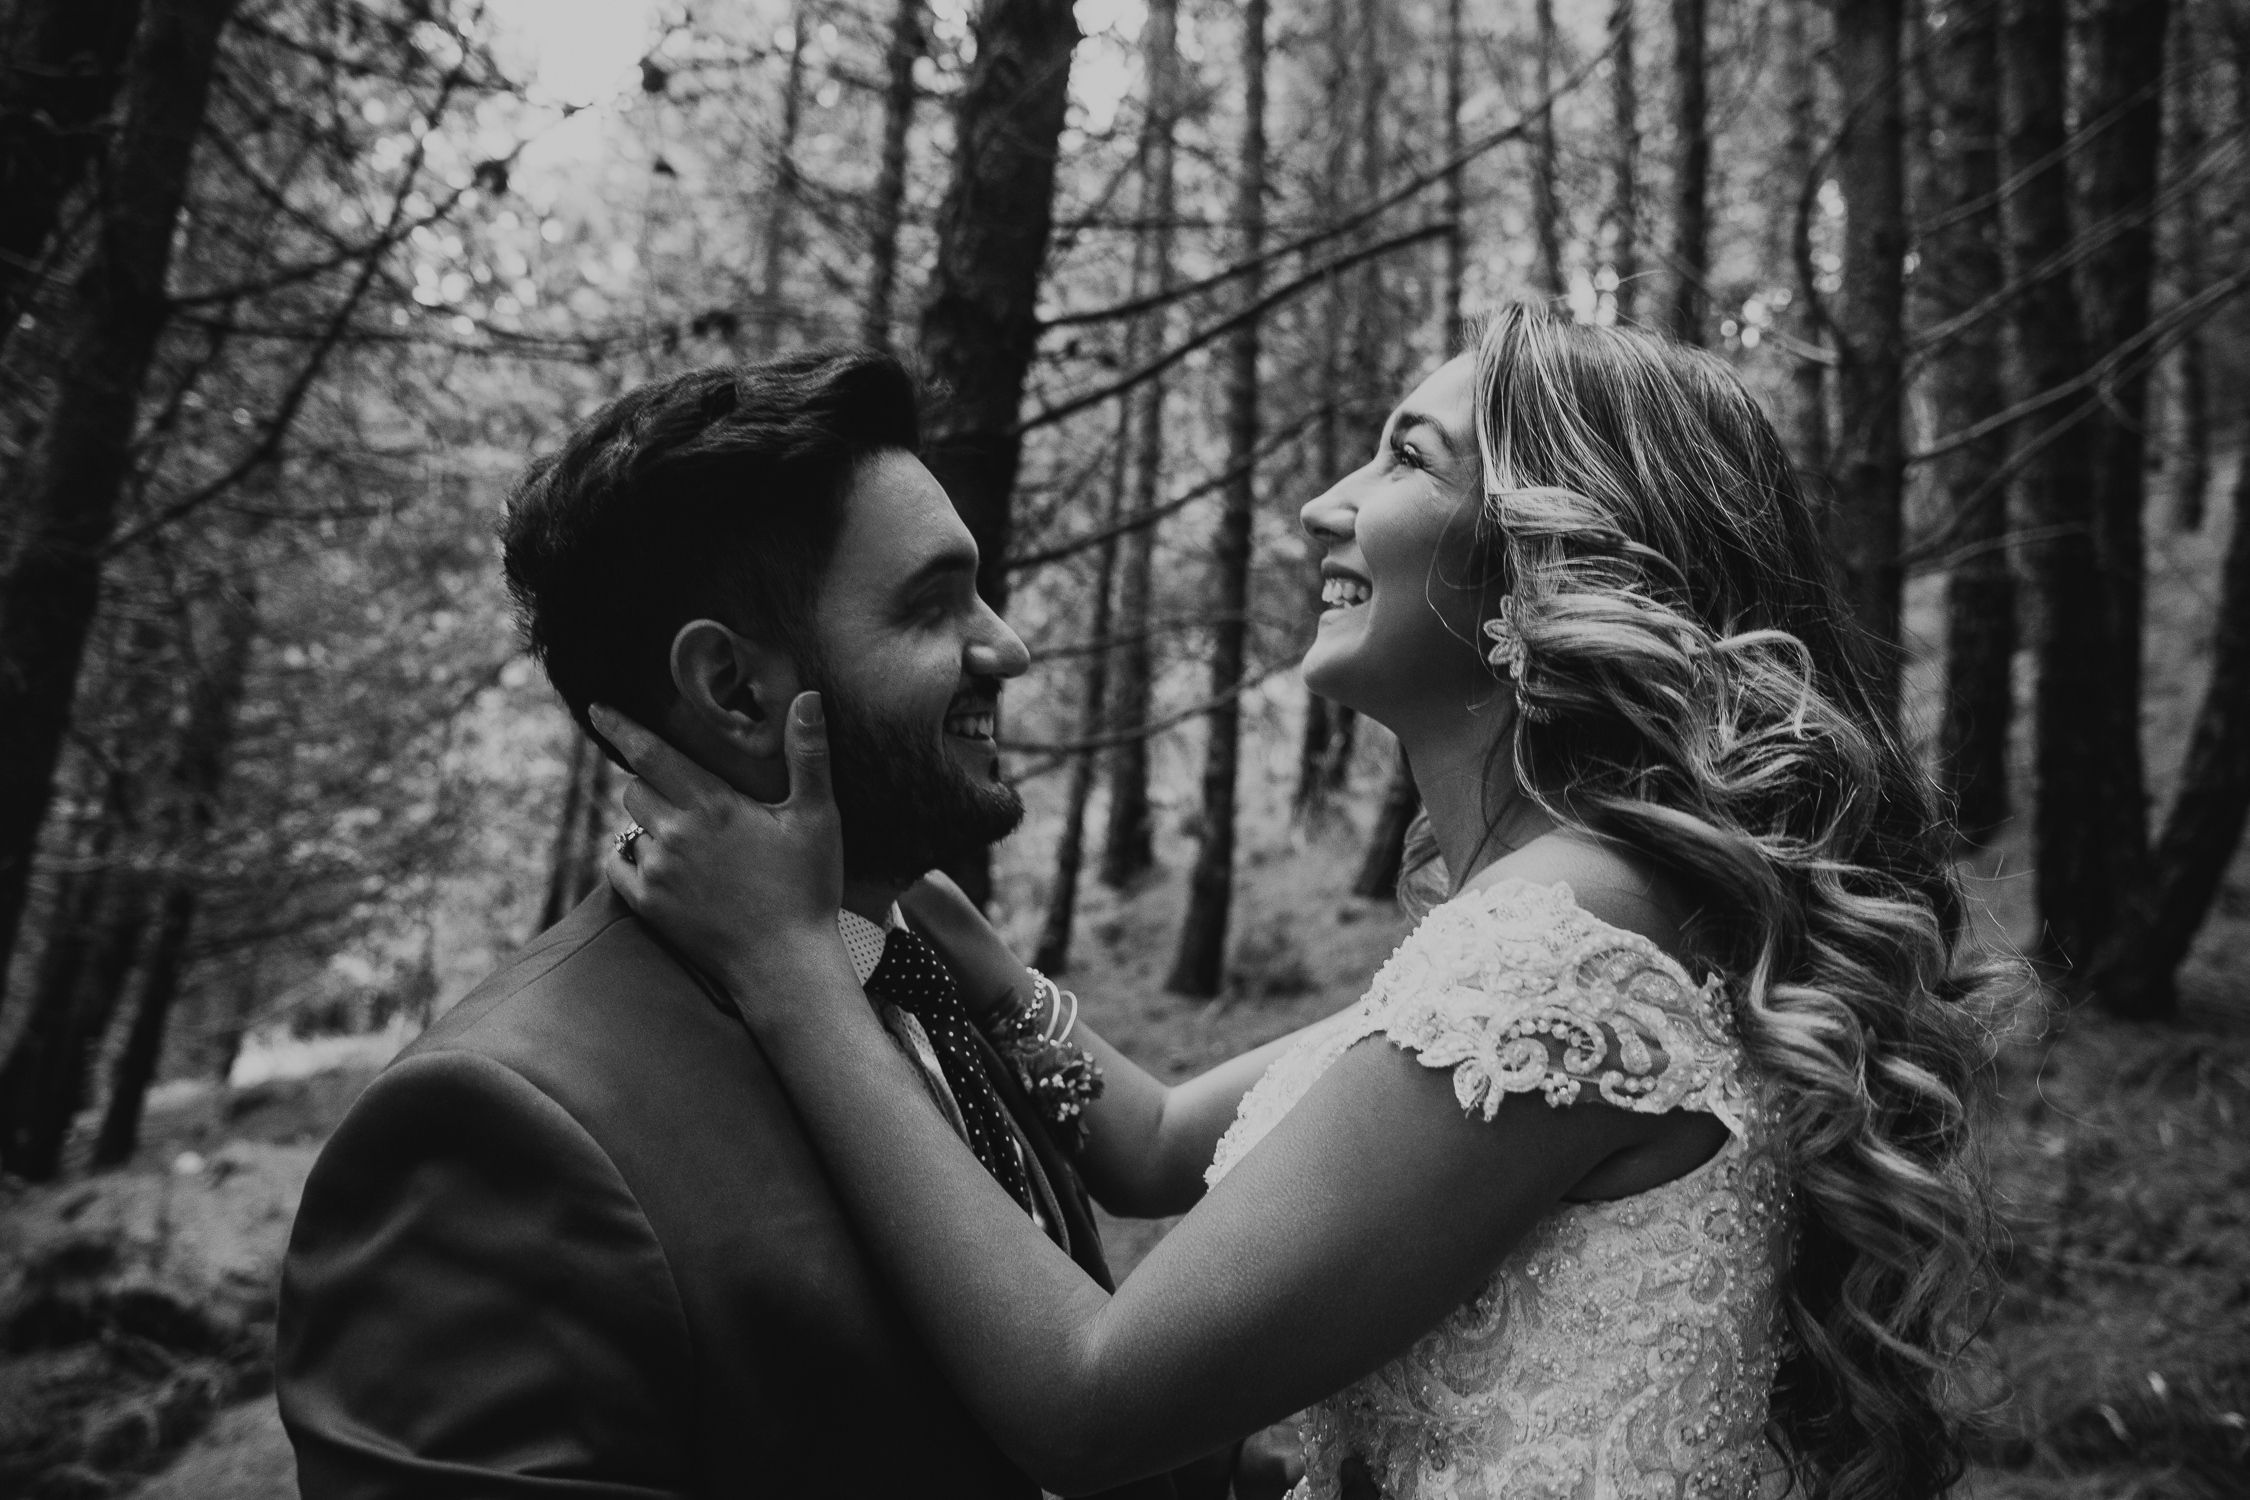 Michelle-Agurto-Fotografia-Bodas-Destination-Wedding-Photographer-Ecuador-Sesion-Johanna-Eduardo-40.JPG